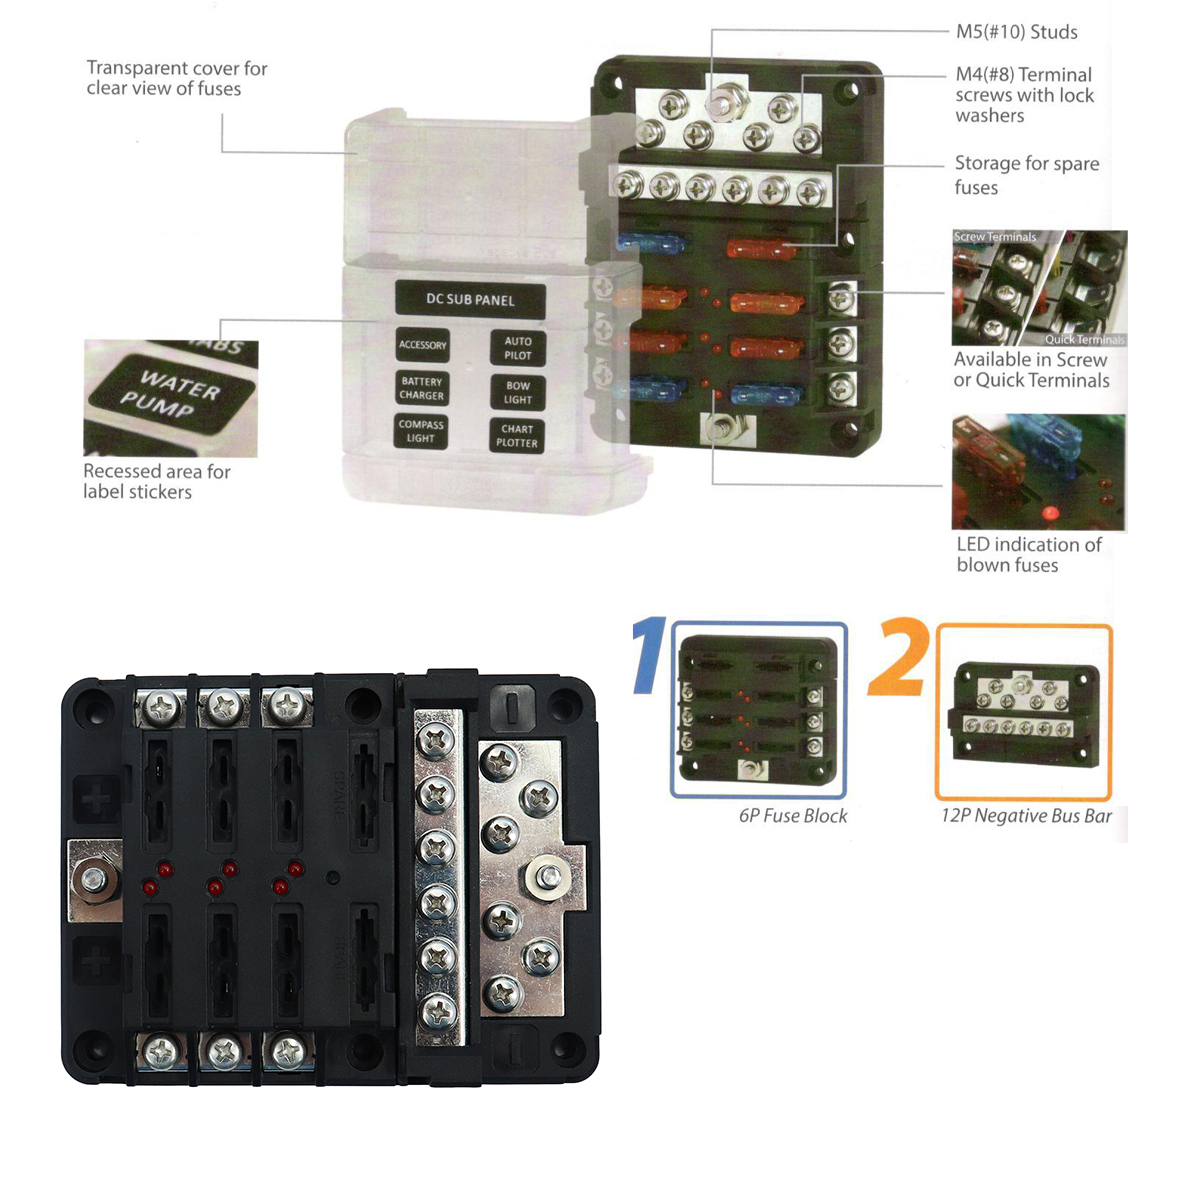 f3618 dc fuse box with lamp 12 bit negative common box modular fl70 fuse holder diagram [ 1200 x 1200 Pixel ]